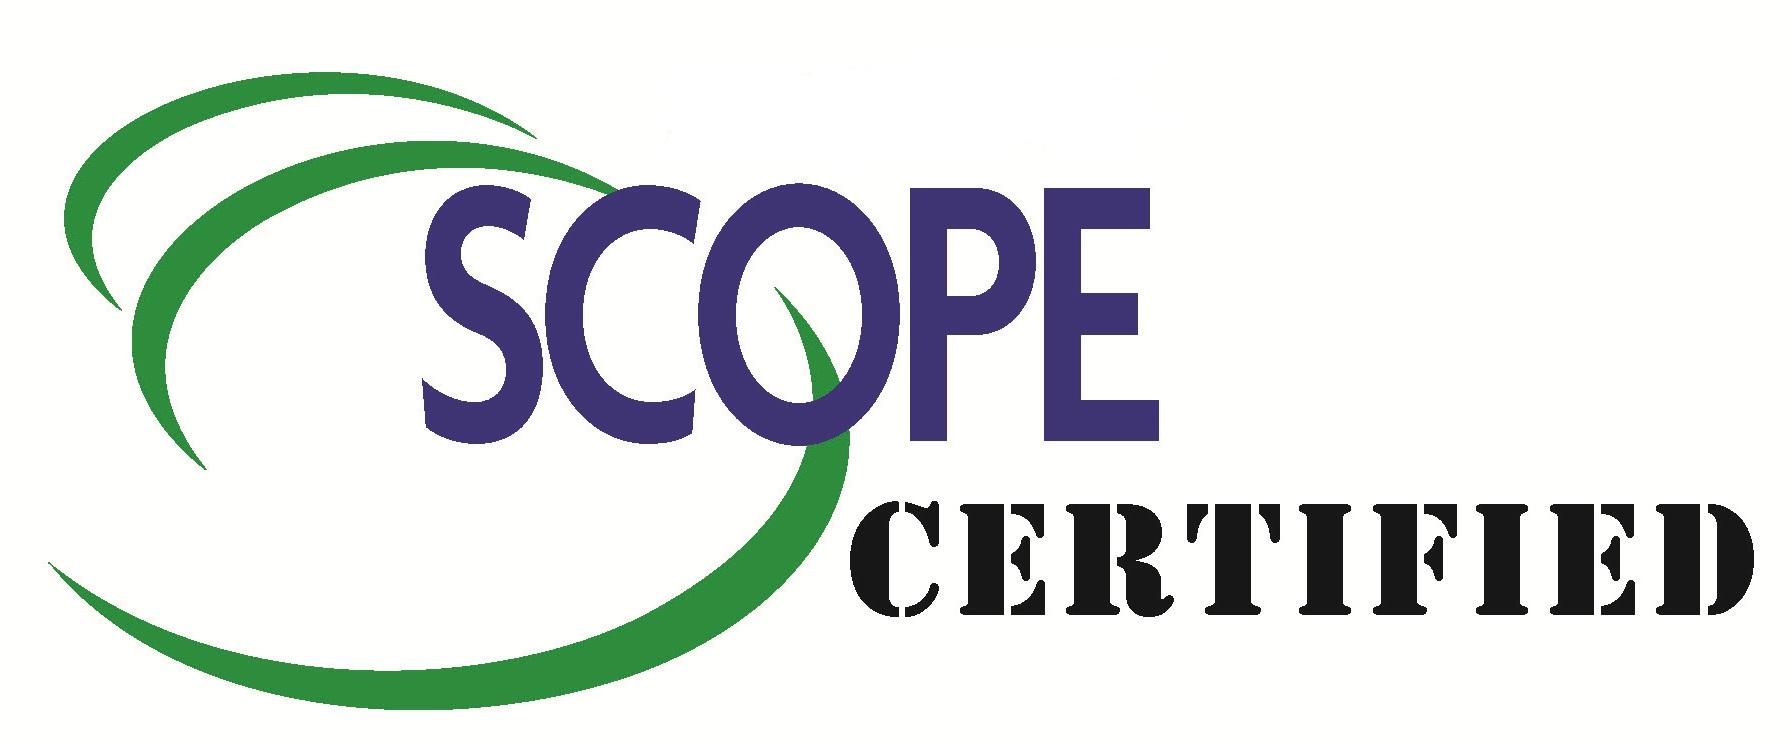 Scope Certified Virginia Beach Obgyn